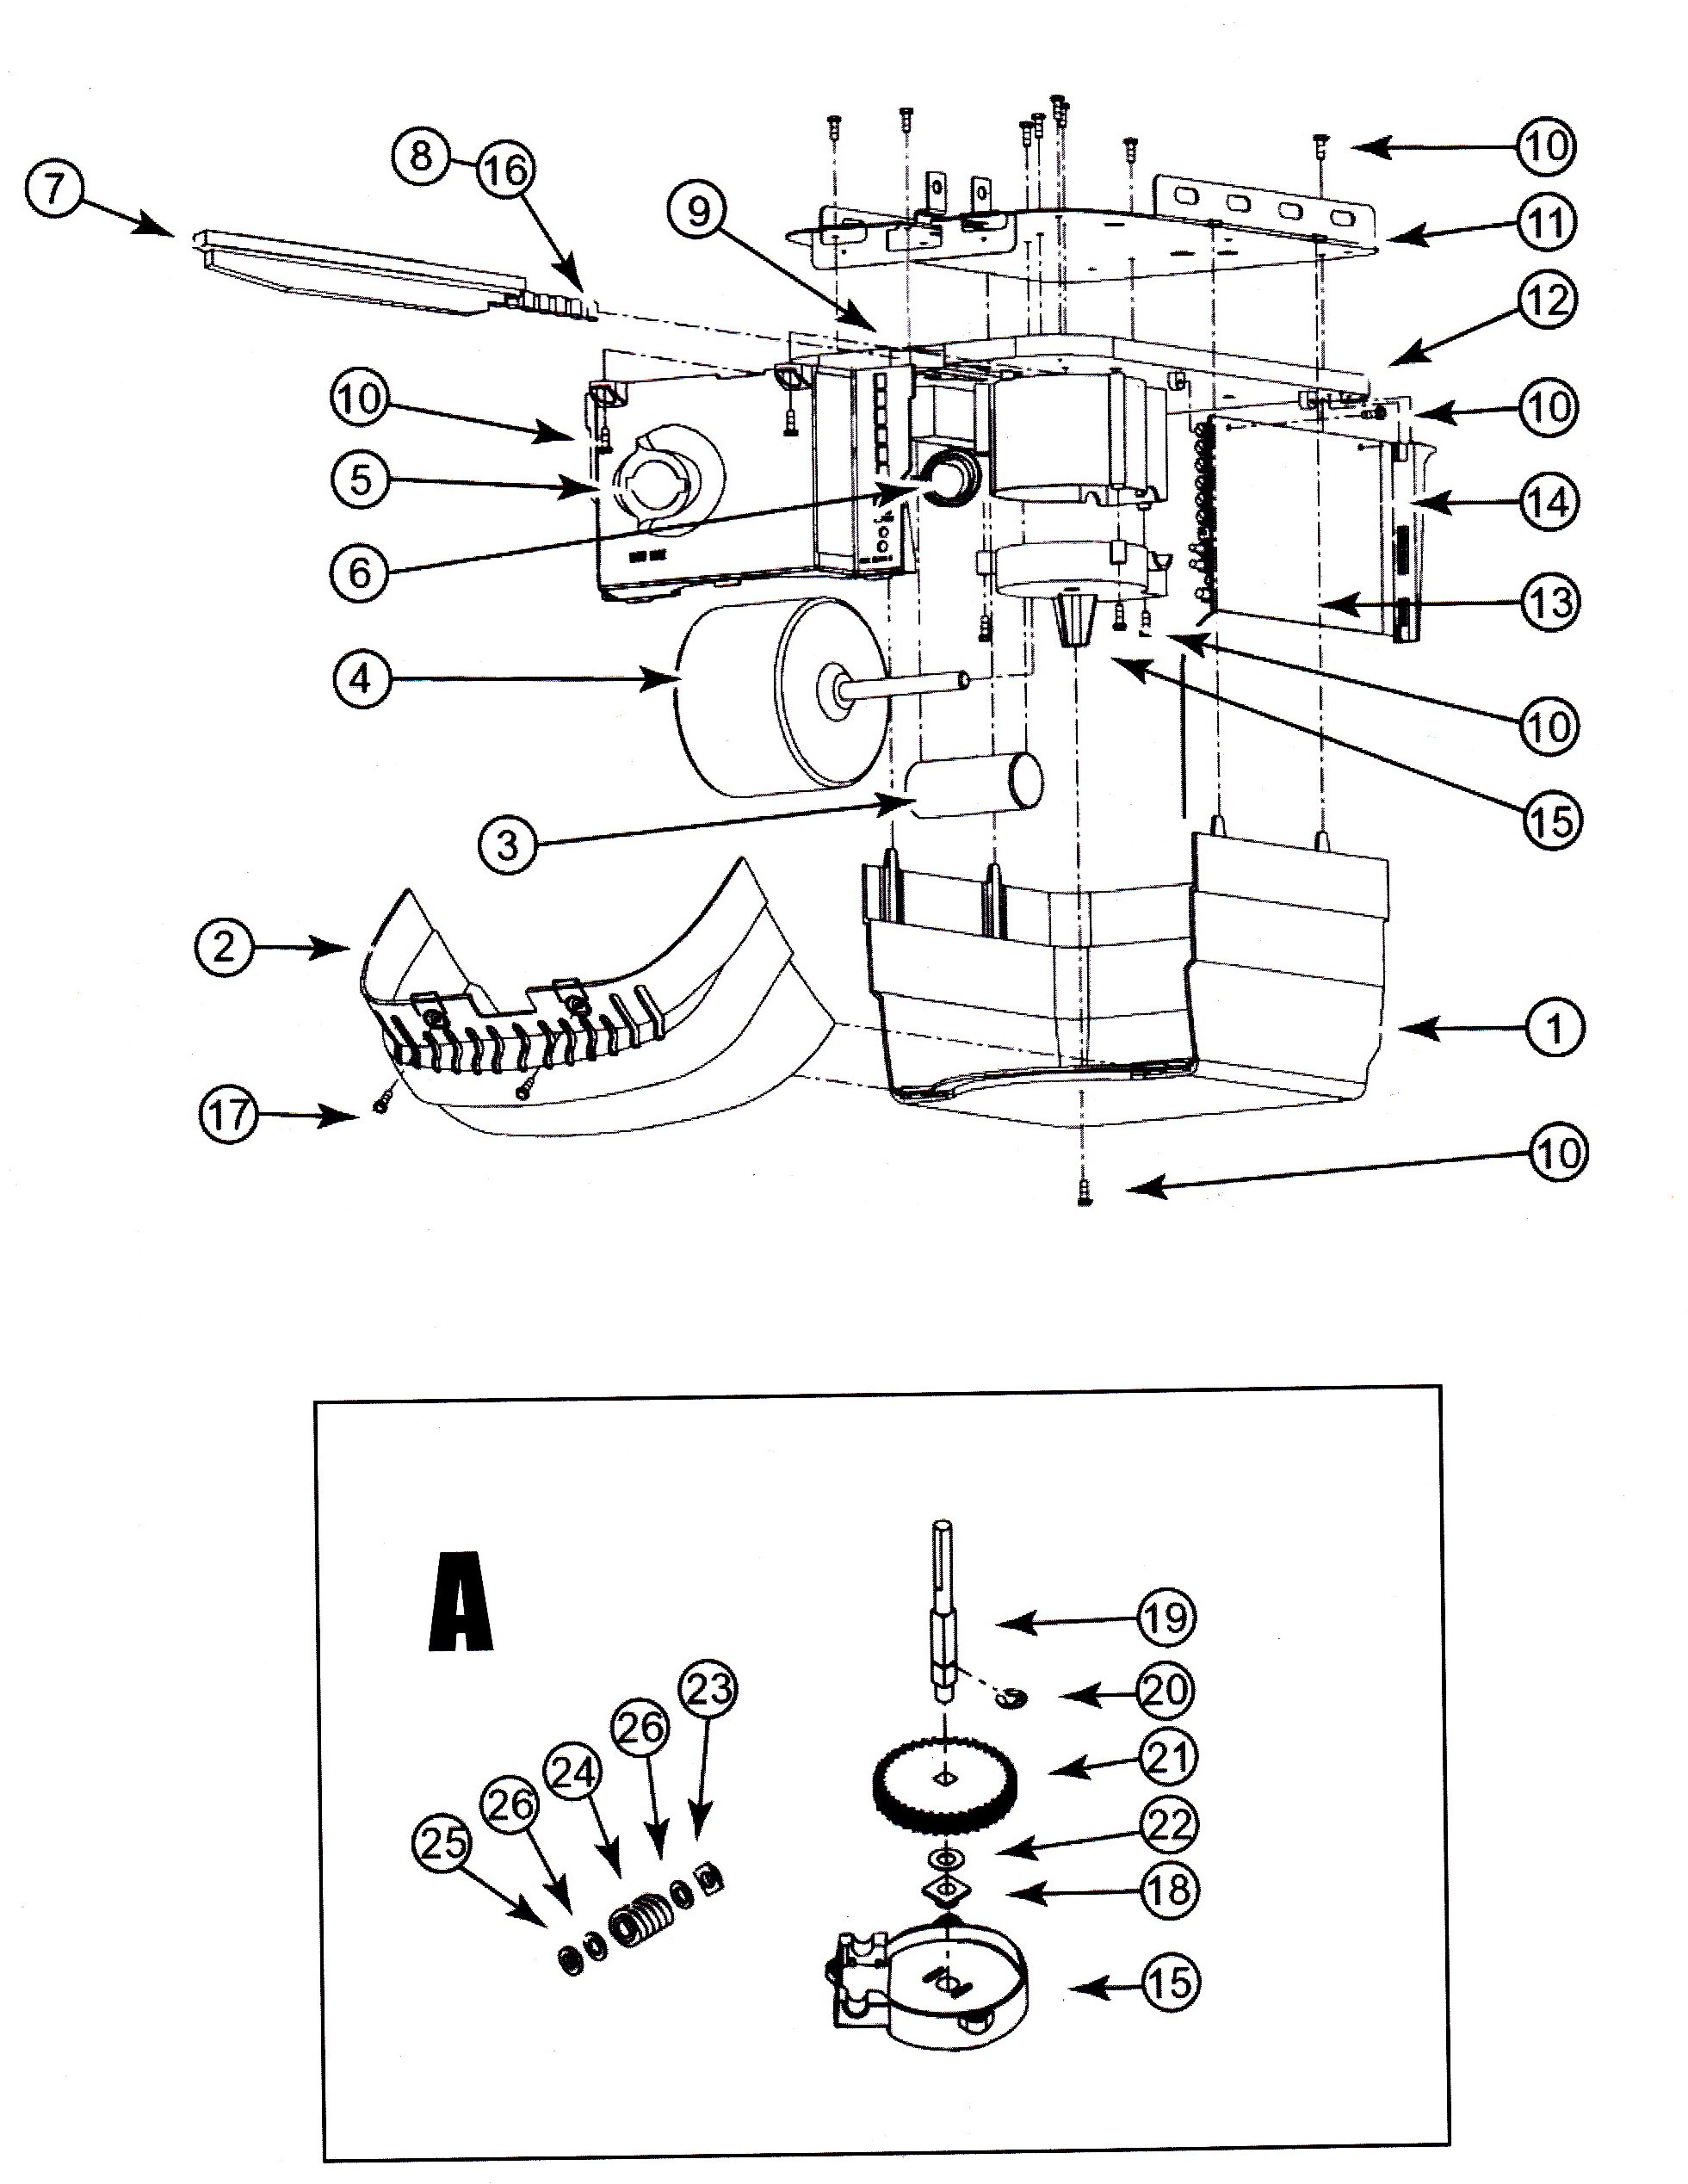 Basic Garage Wiring Diagram Legacy Electrical Diagrams Electric Door Opener House U2022